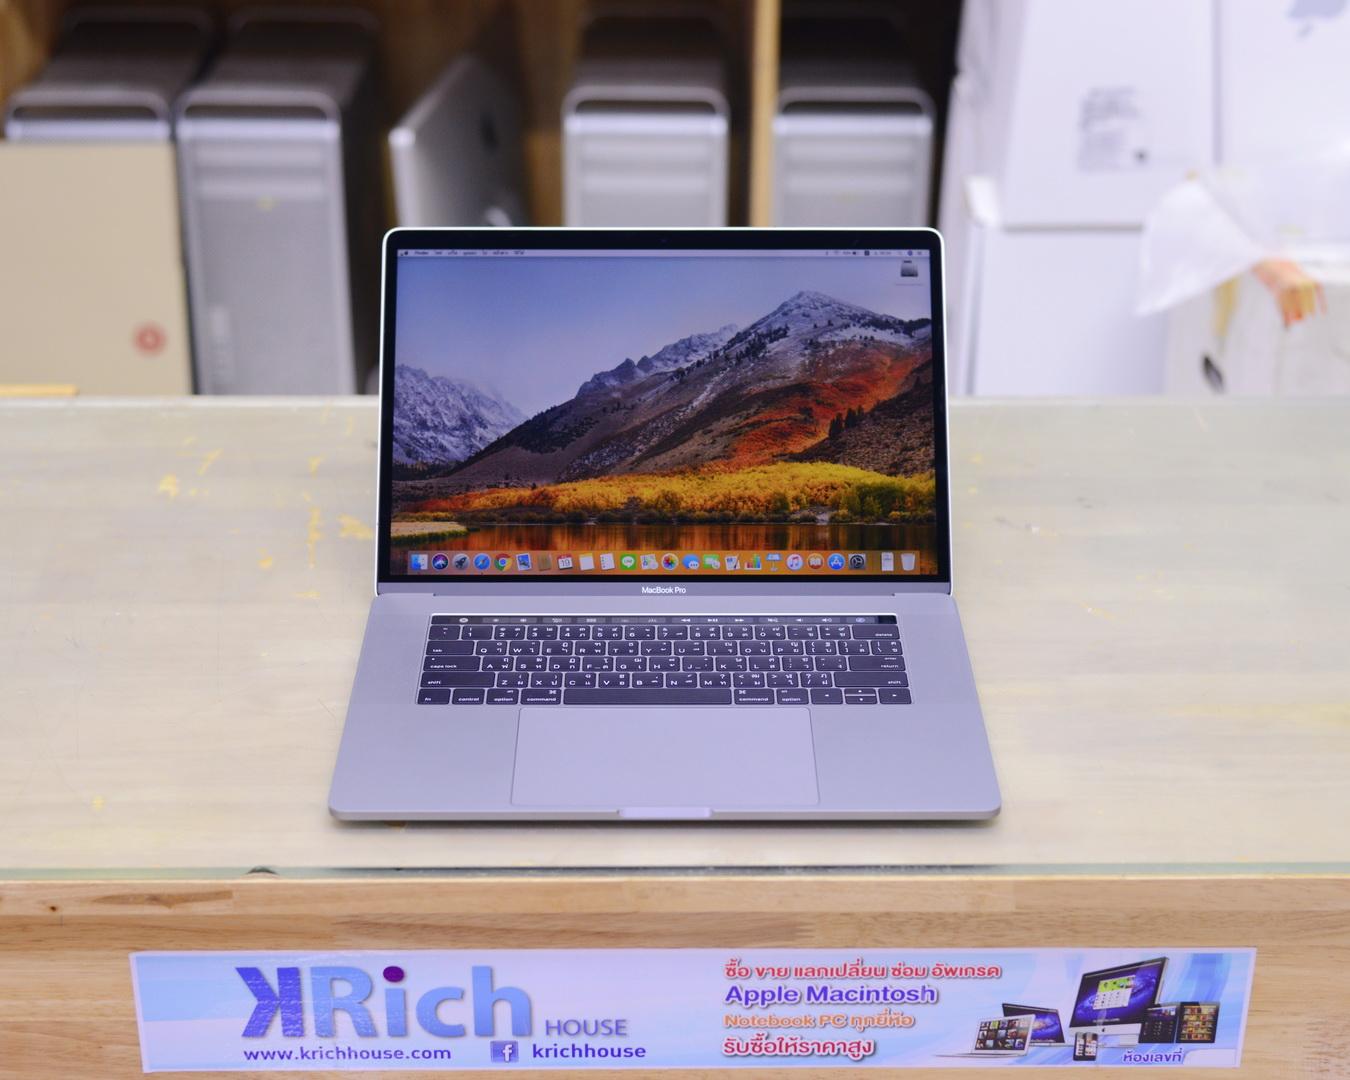 TOP MODEL - MacBook Pro (15-inch, Late 2016) - Quad-Core i7 2.7GHz RAM 16GB SSD 512GB AMD Radeon Pro 455 2GB - New Display